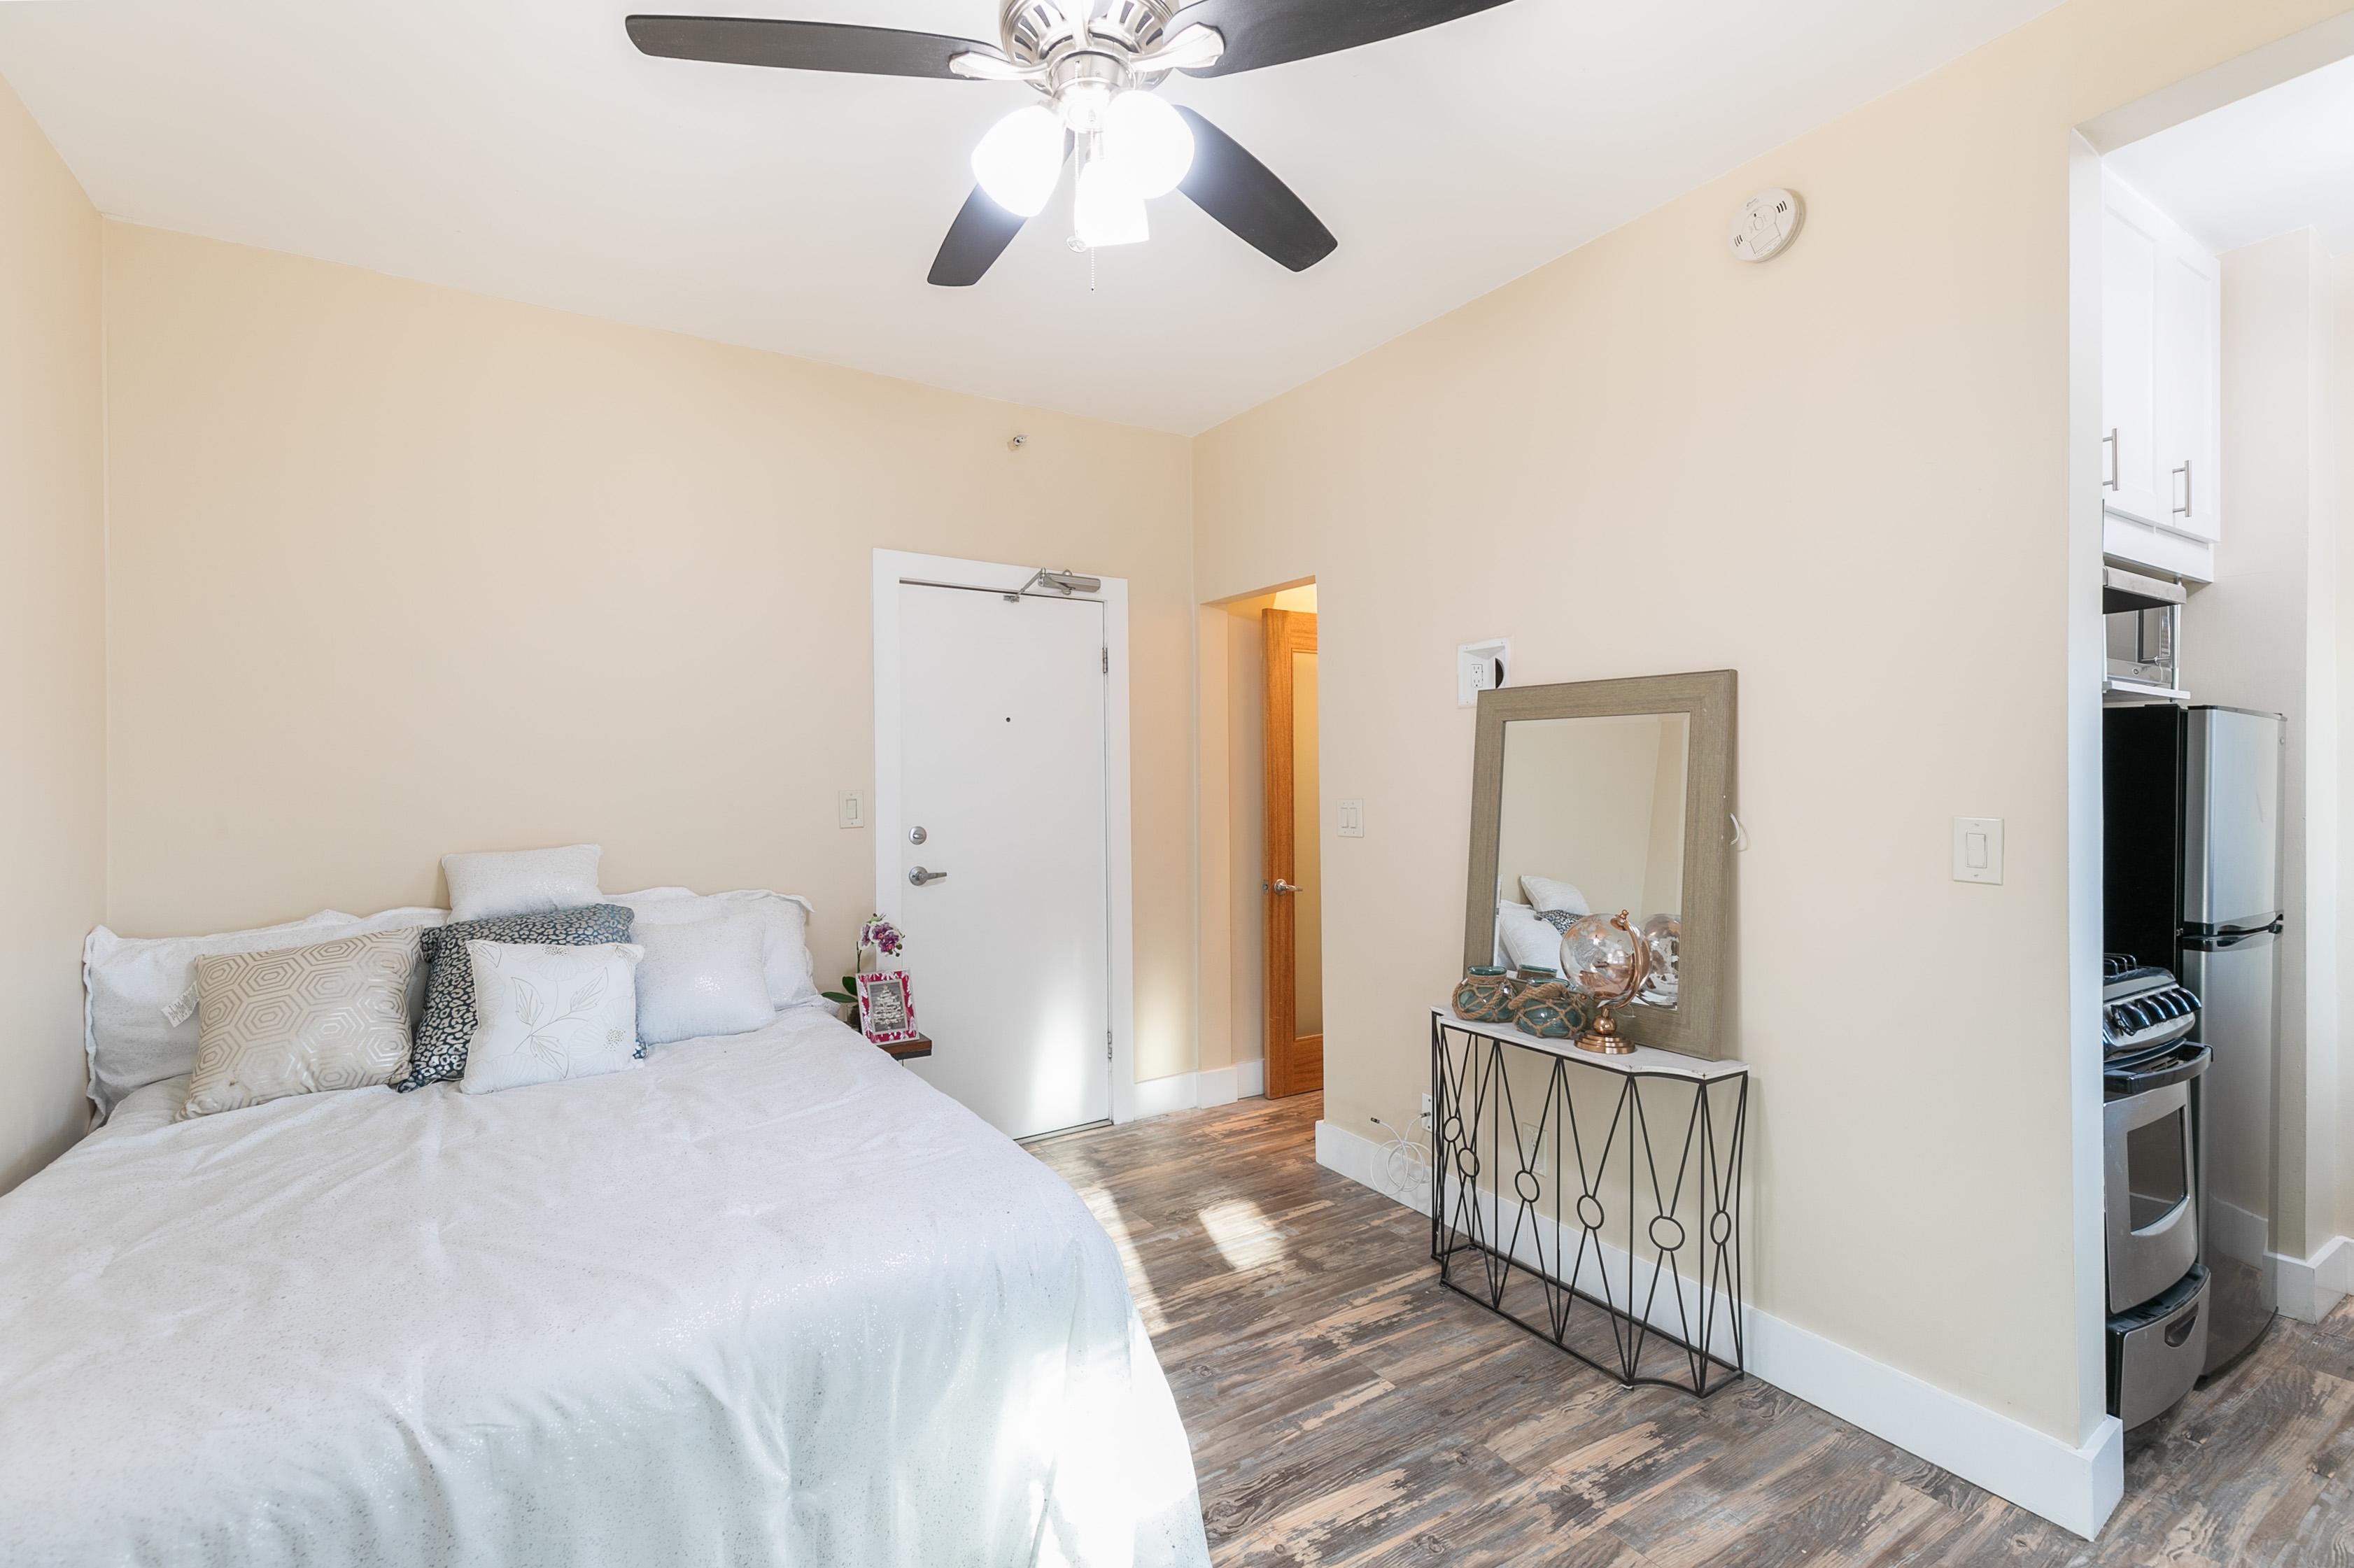 Easy-Breezy Studio Living | Modern Updates | Prime Venice Beach Location